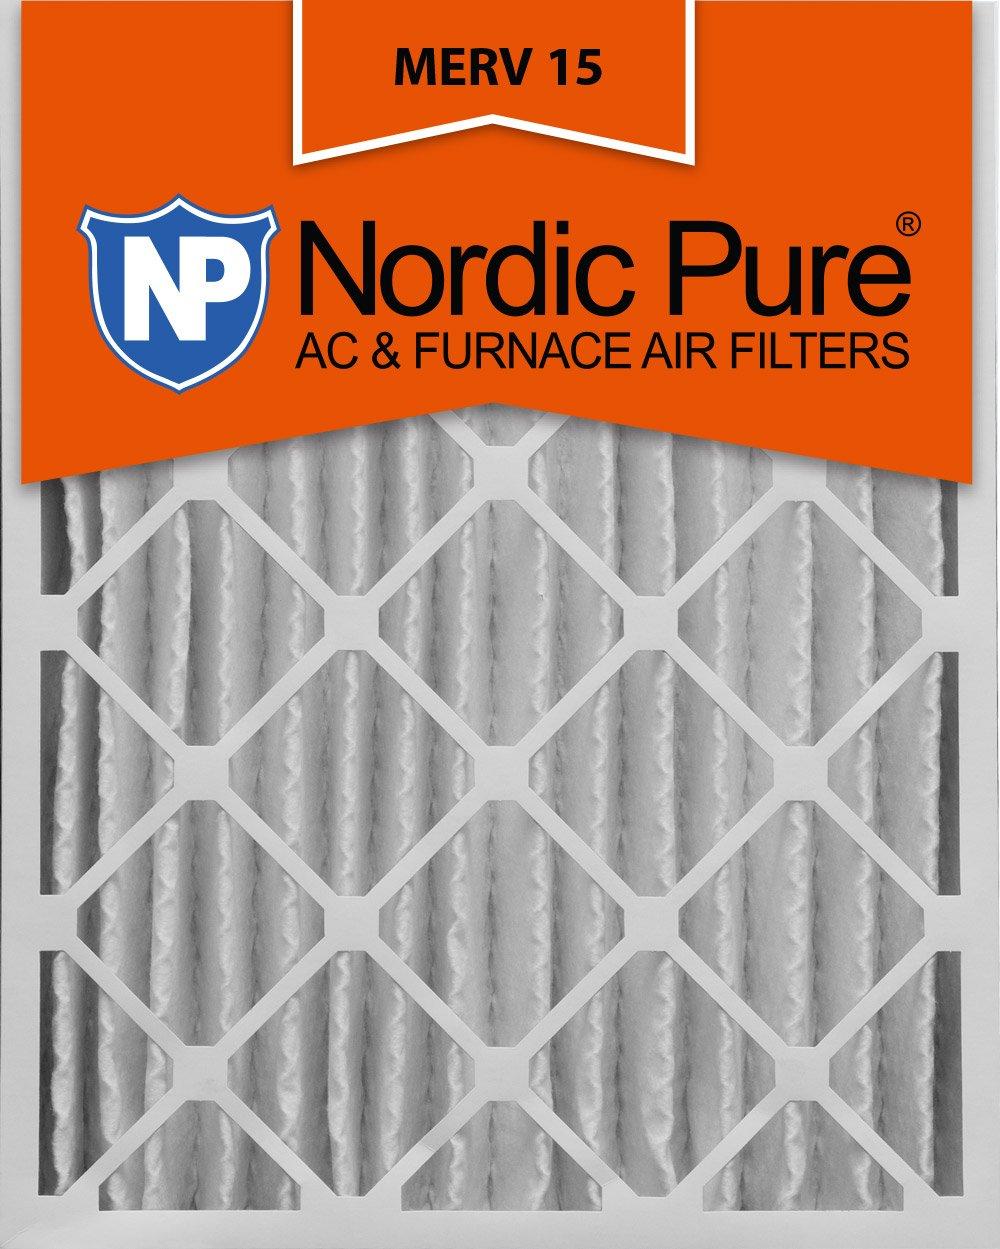 Qty 1 18x24x4 3-5//8 Actual Depth Nordic Pure 18x24x4 MERV 15 Air Condition Furnace Filter